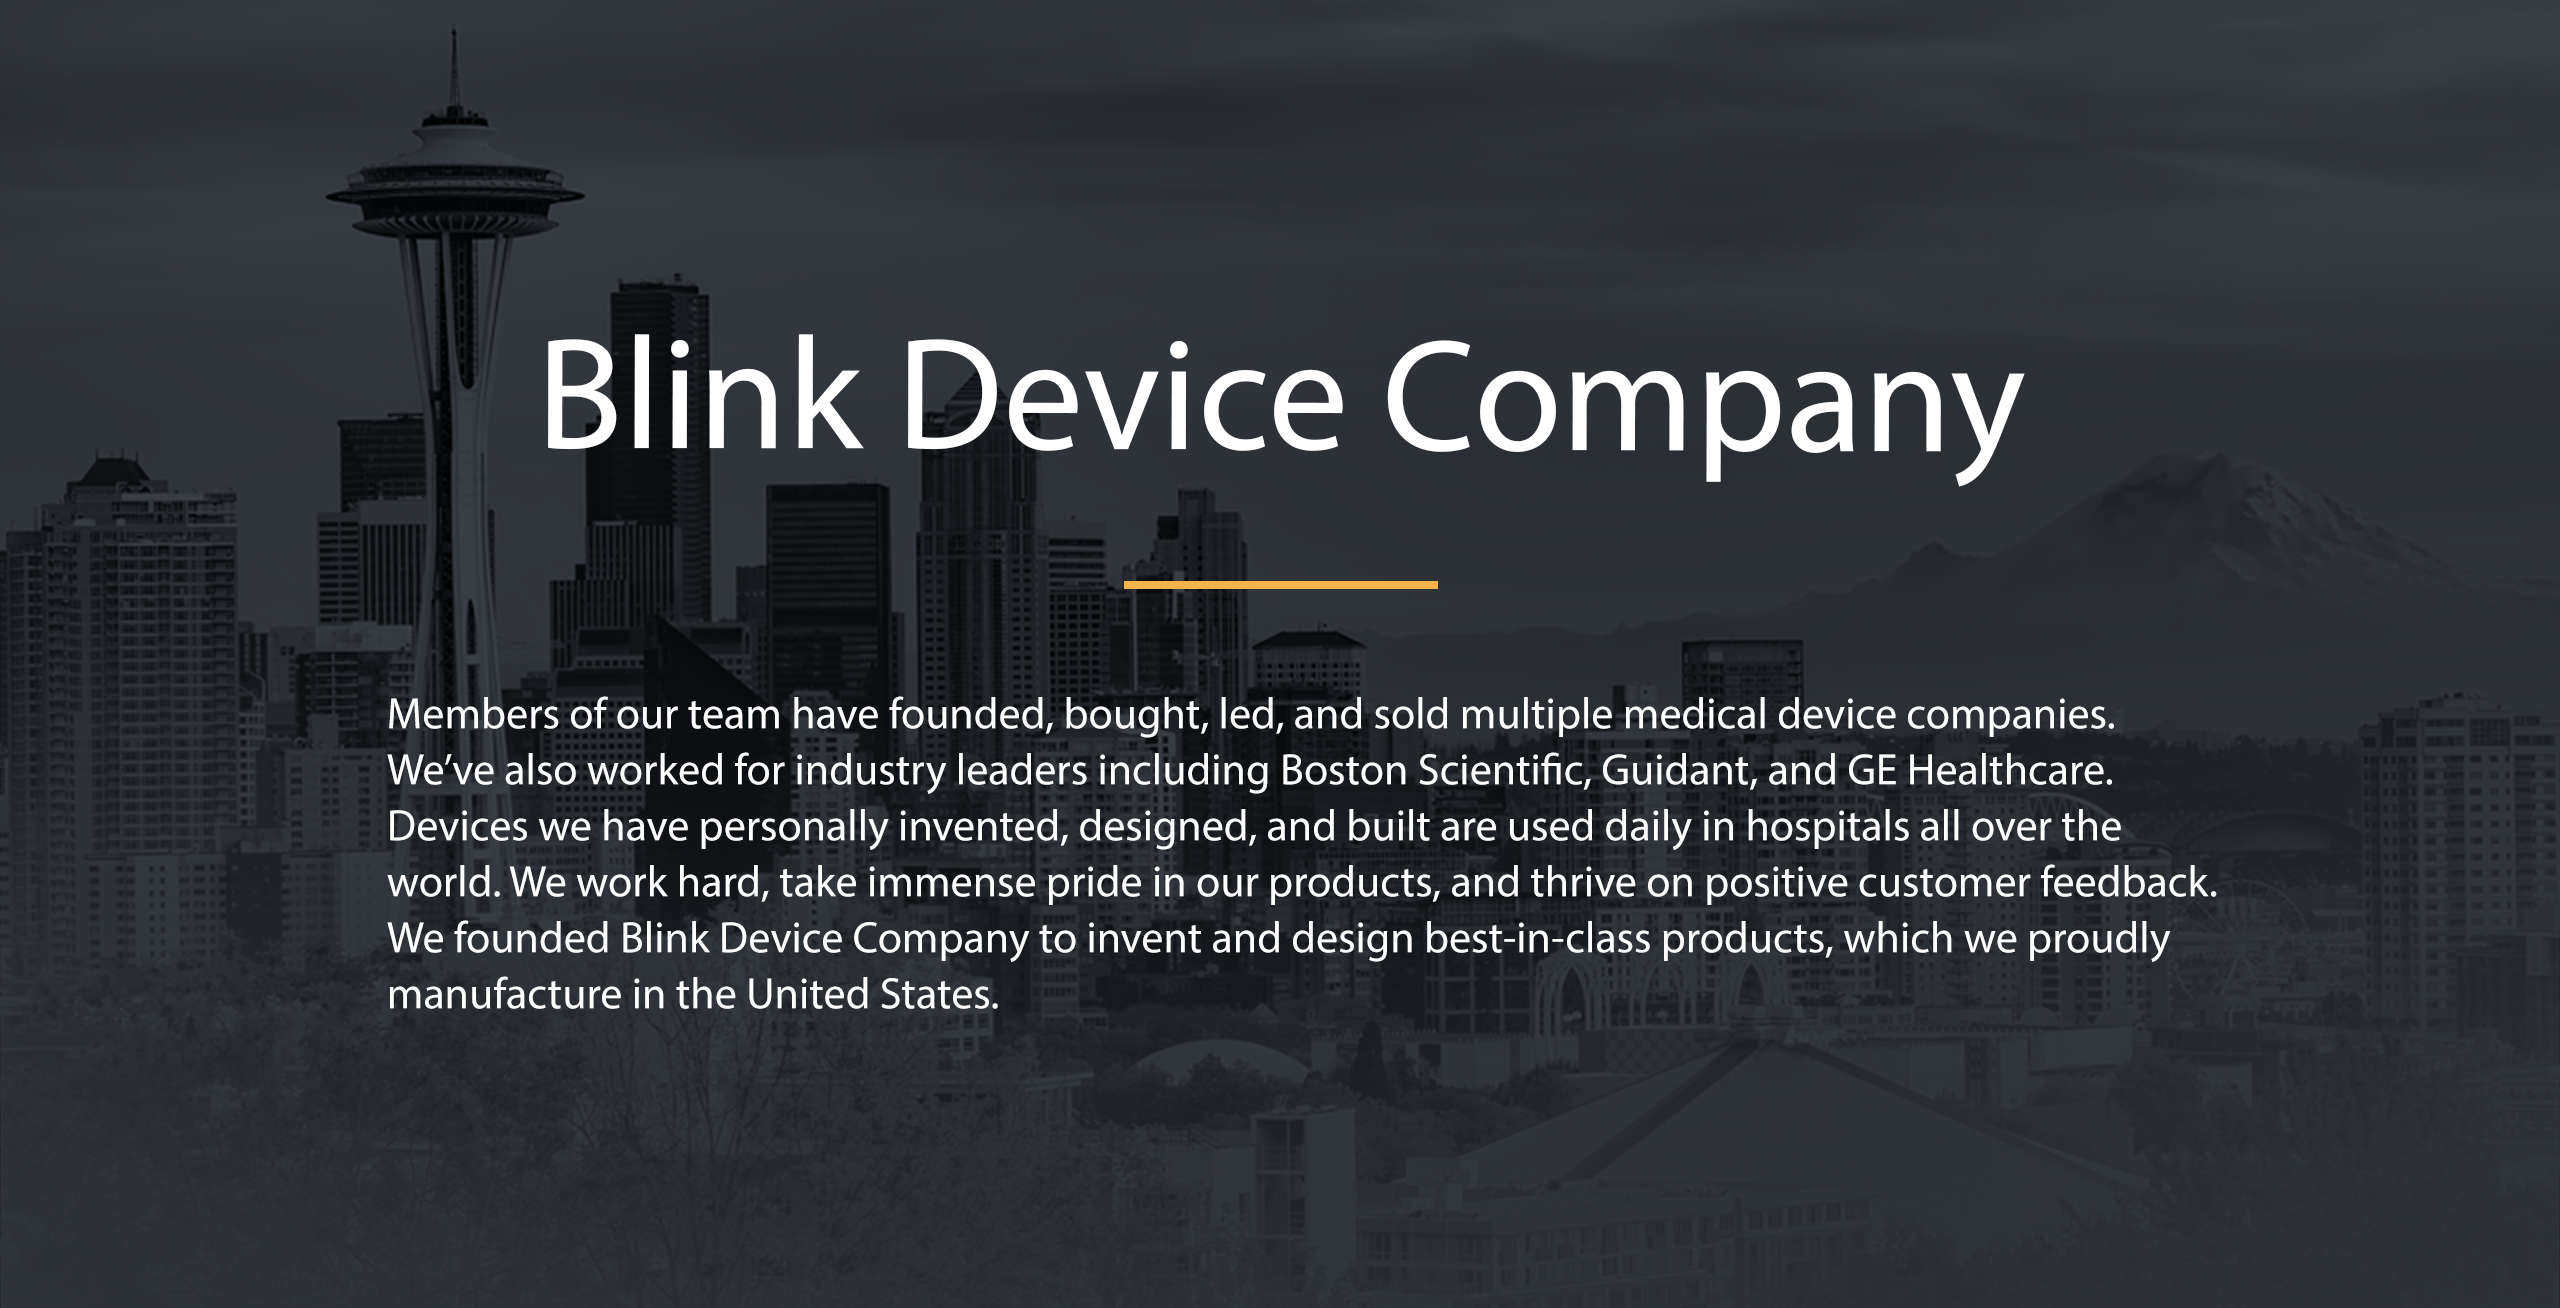 Blink Device Company